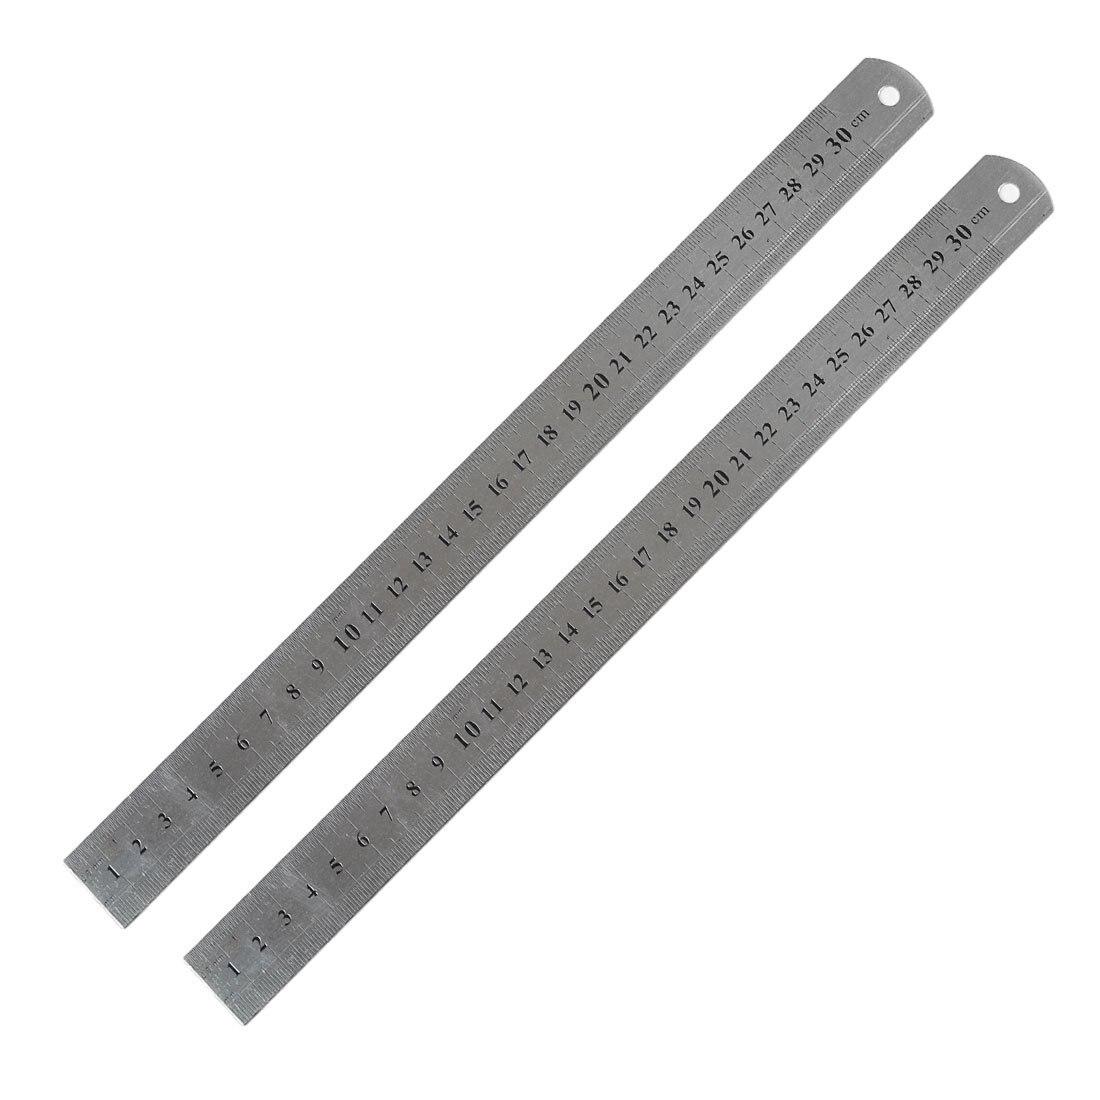 2 Pcs Metric 30cm Stainless Steel Straight Ruler Measuring Tool 12